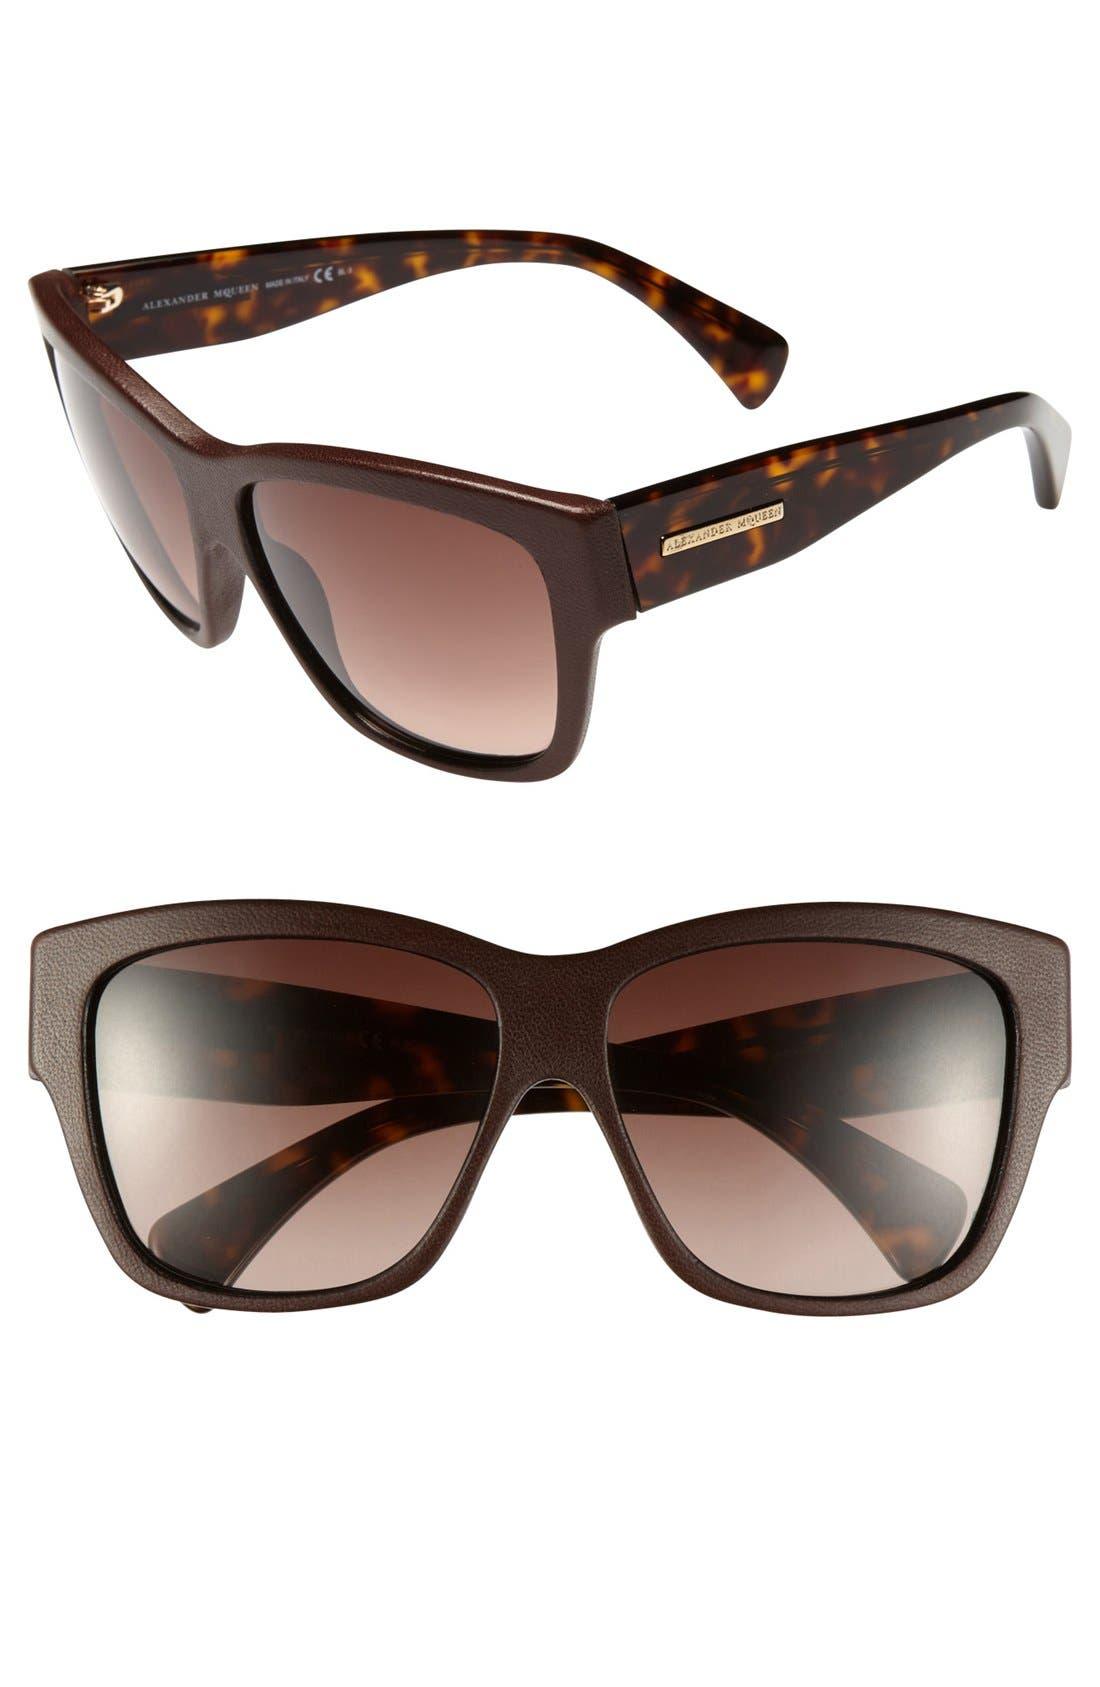 Alternate Image 1 Selected - Alexander McQueen 59mm Retro Sunglasses